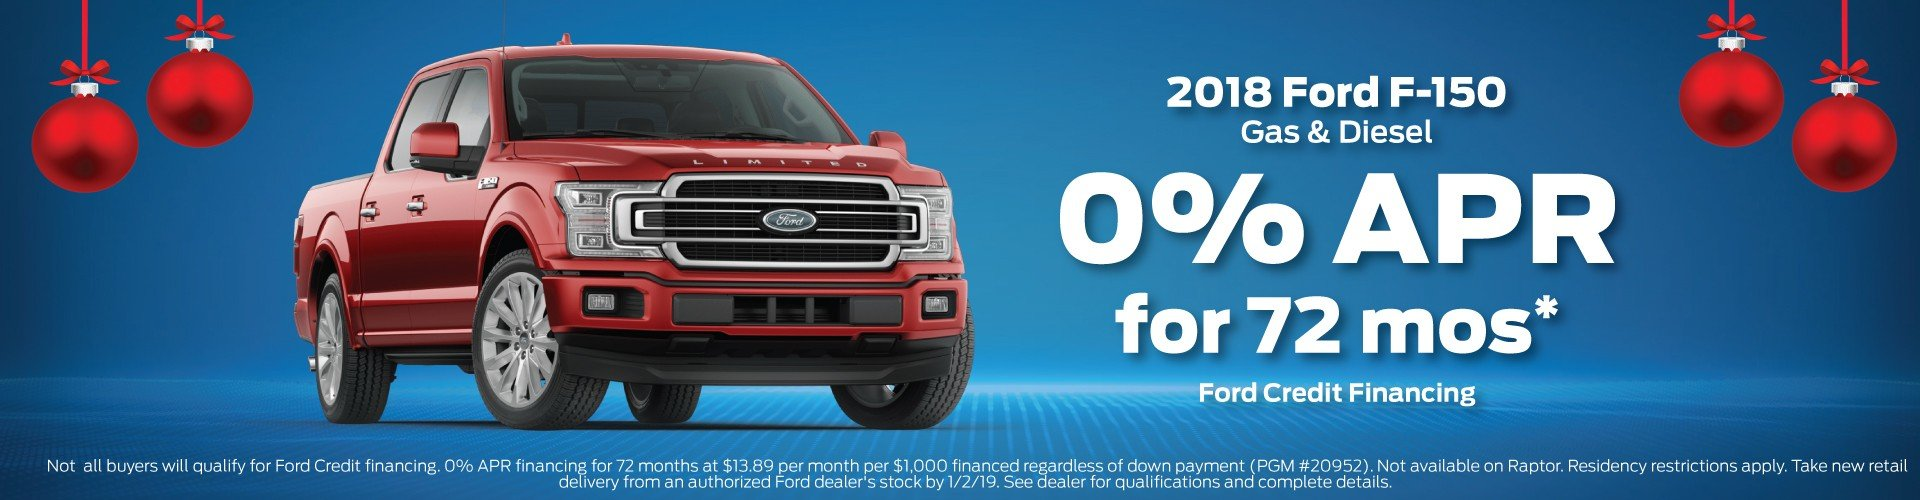 Ford f150 finance offer 12 2018